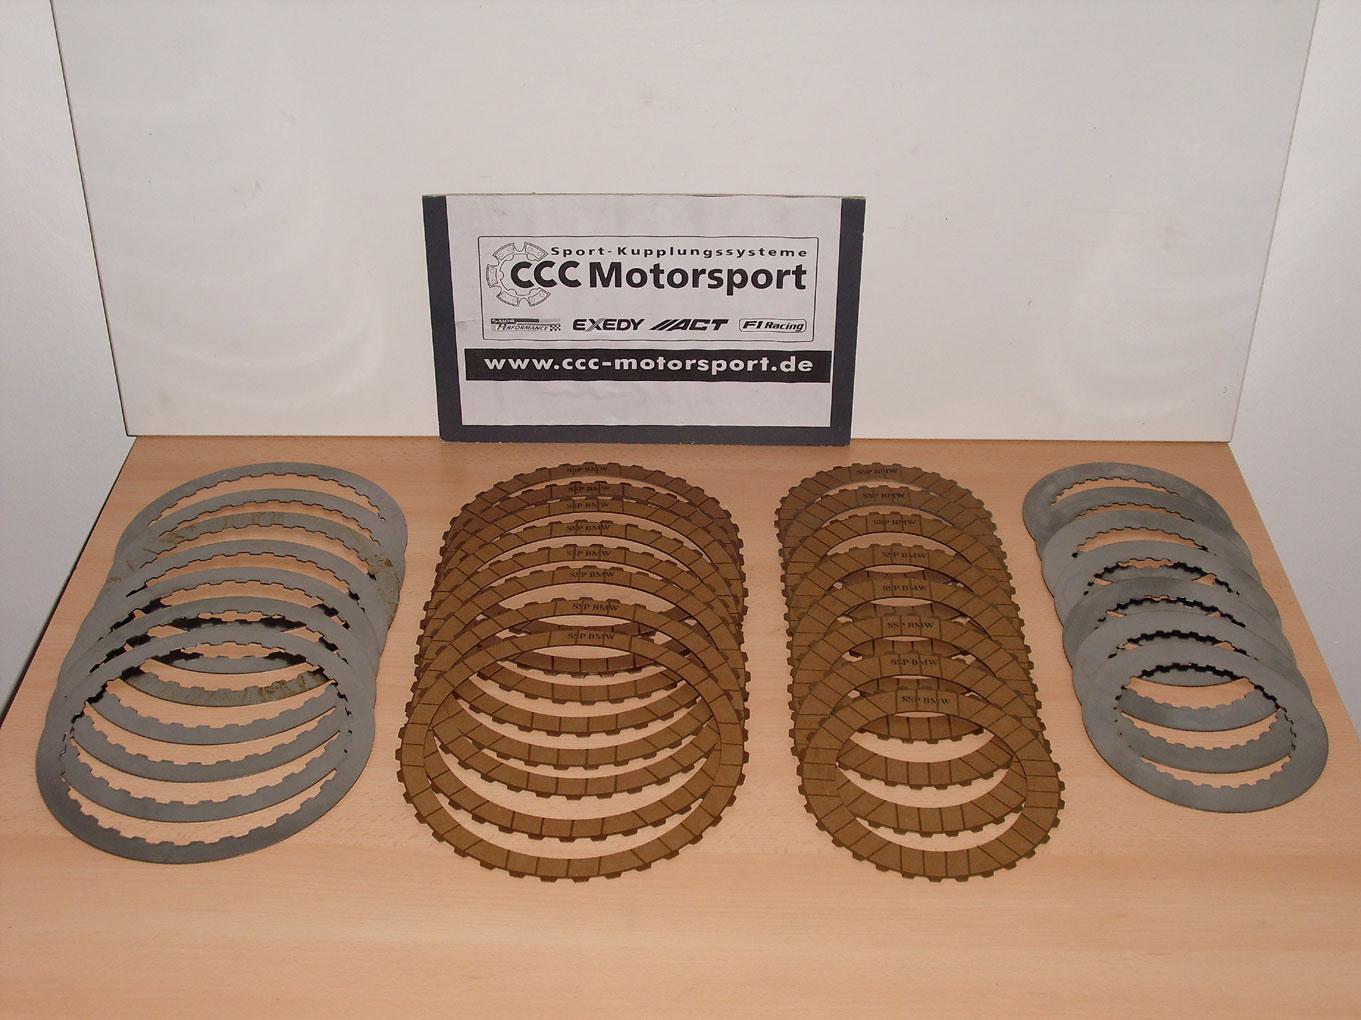 NRC clutch kit discs reinforced DSG VW Passat B8/3G 2 0TSI 900NM Upgrade  DQ500